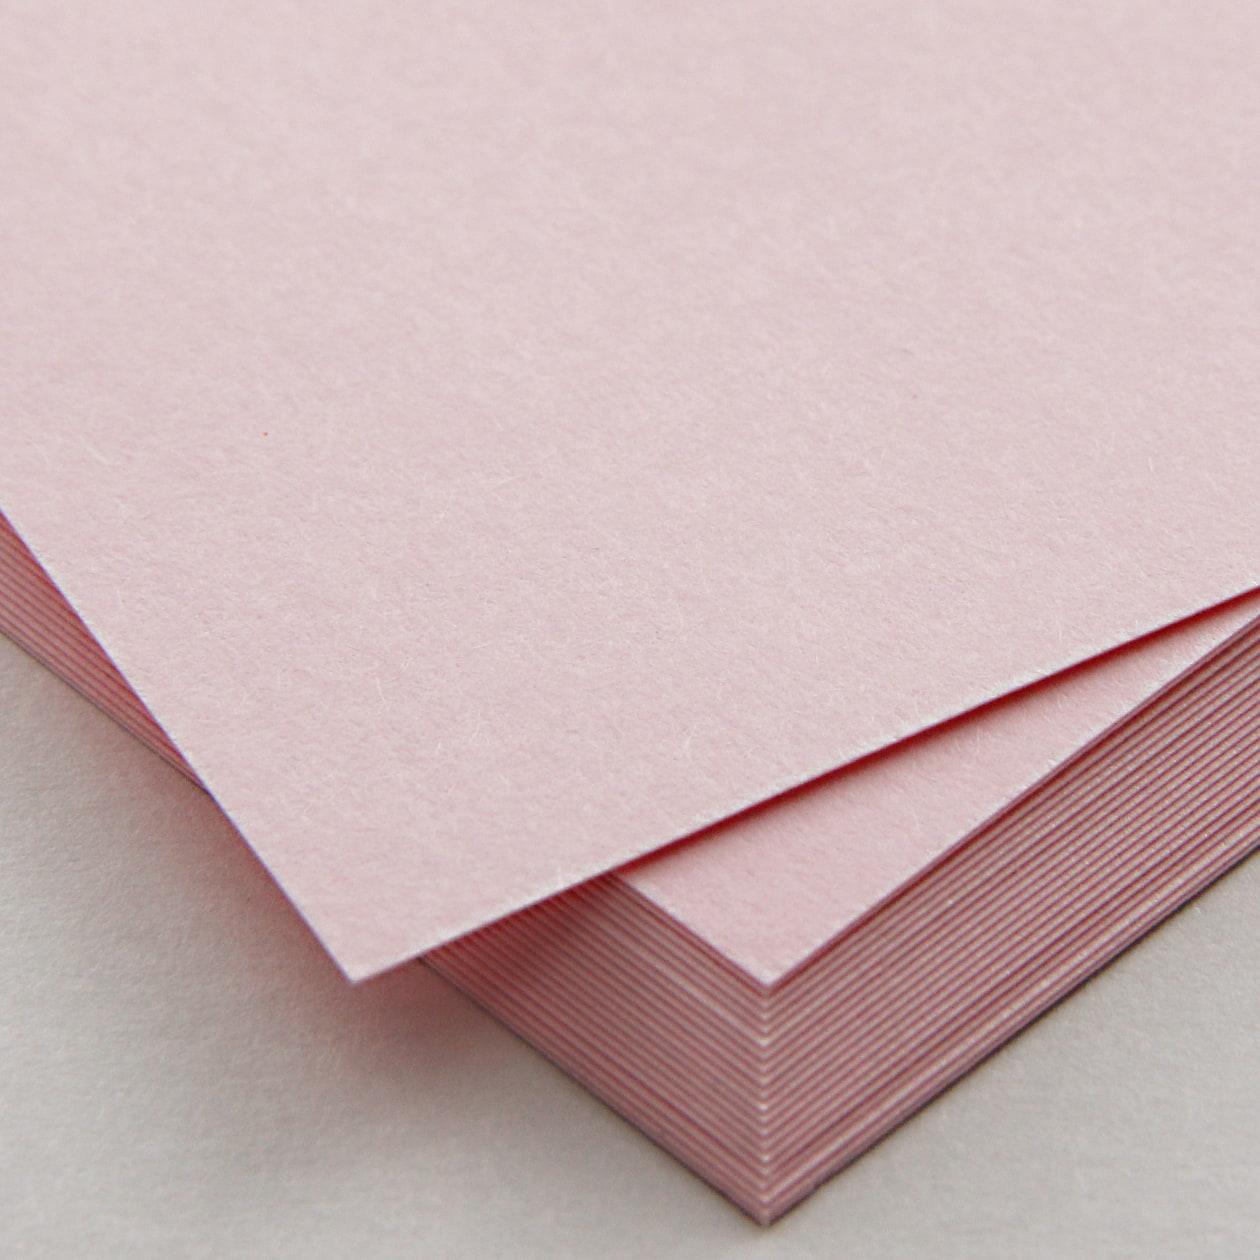 A4シート 上質カラー ピンク 90.7g